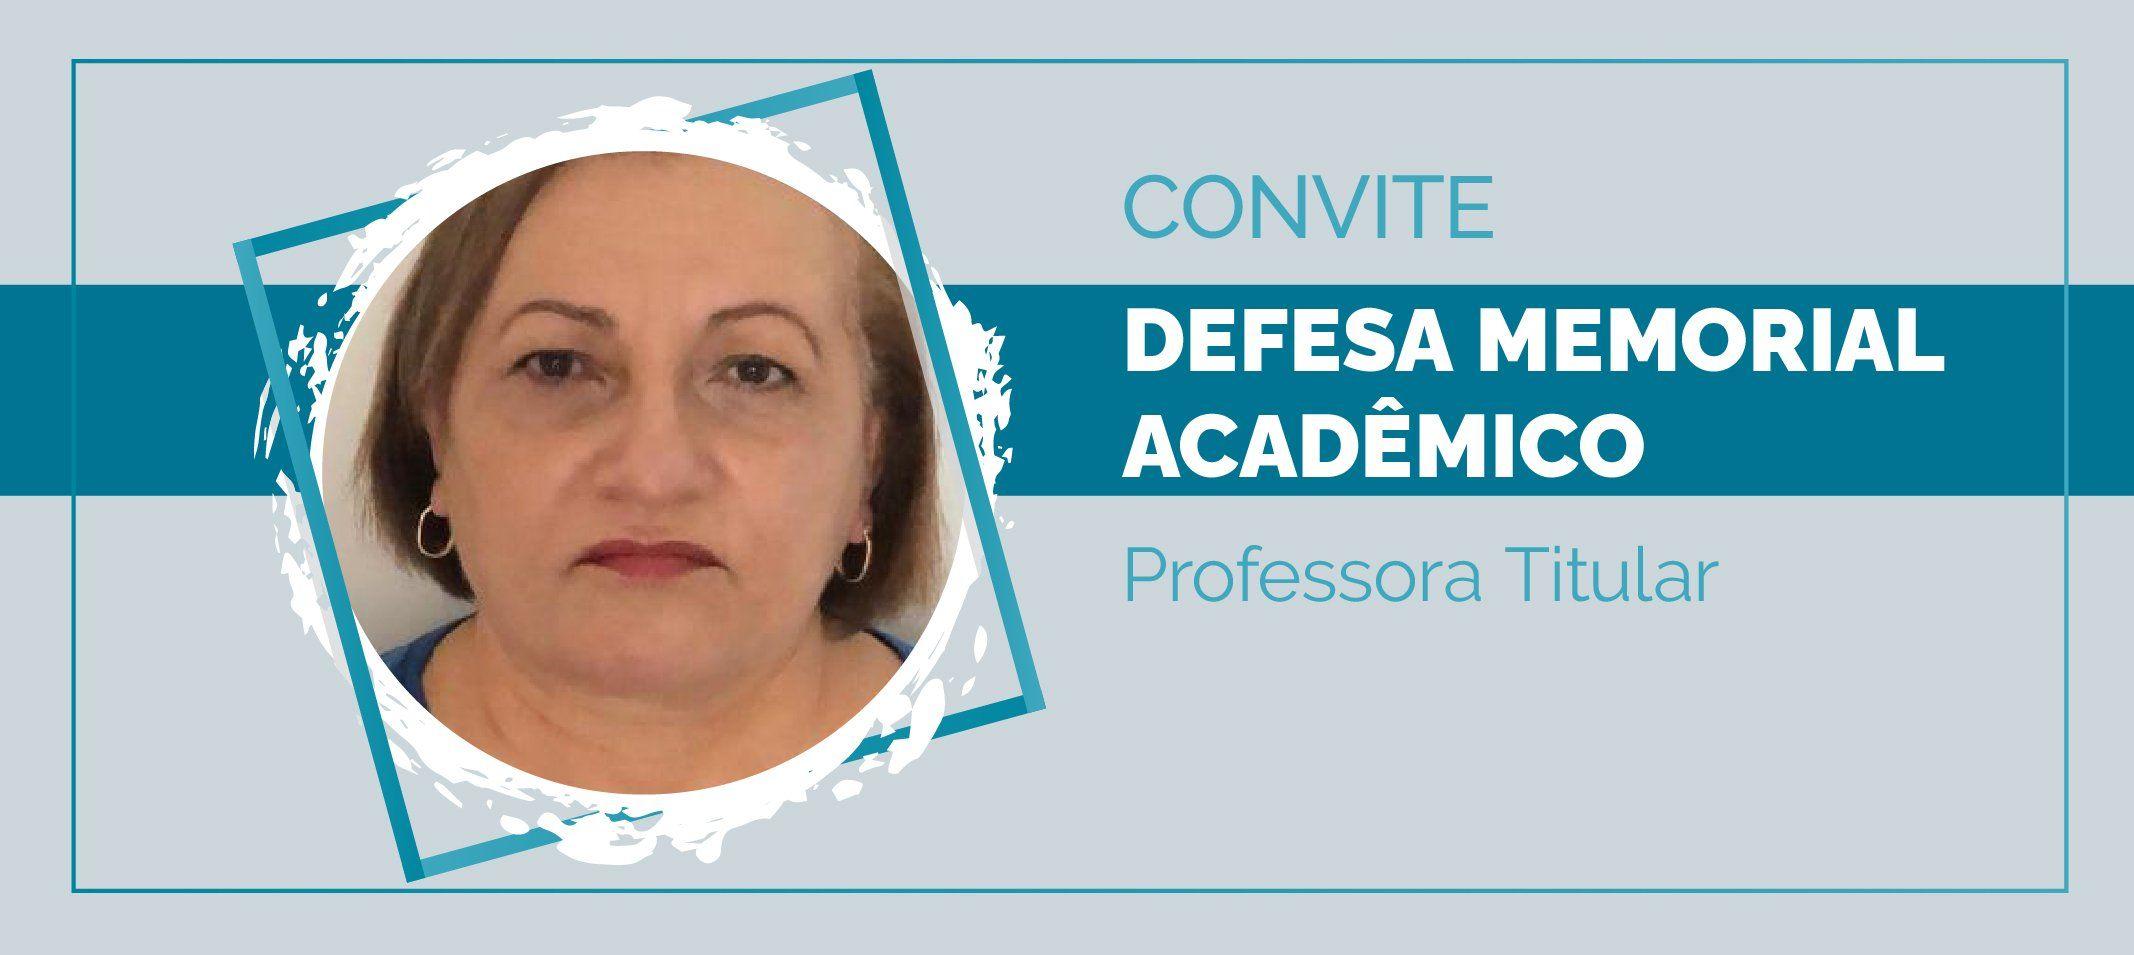 Professora Maria Ivone Lopes da Silva defende memorial para ascender à Titular